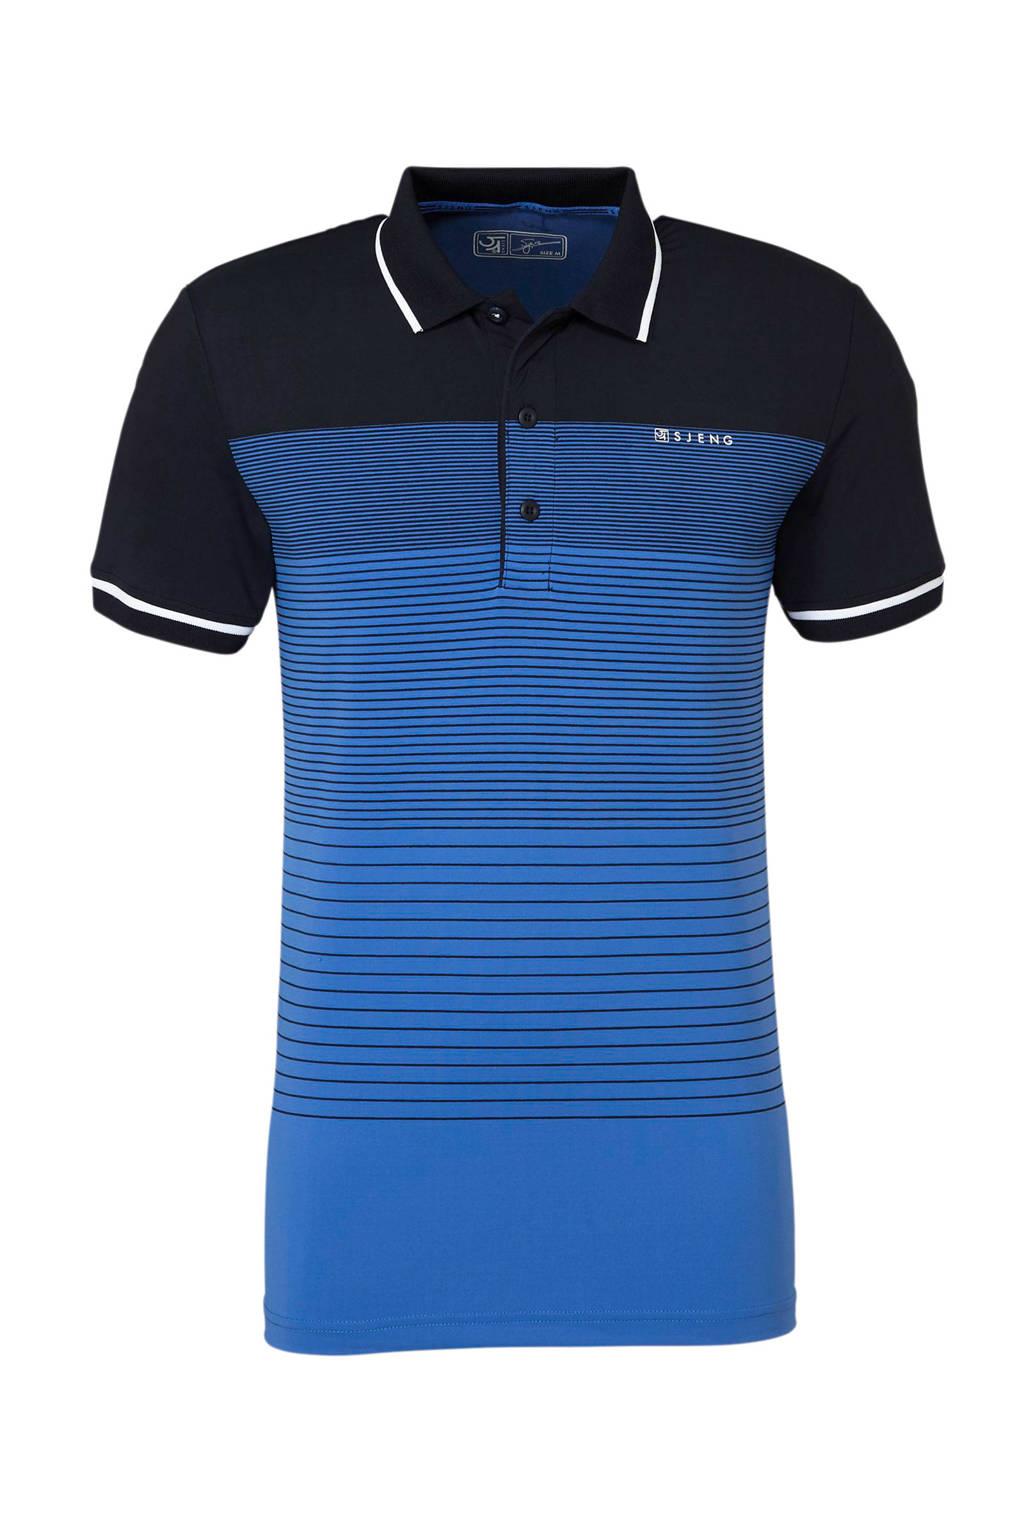 Sjeng Sports   polo, Donkerblauw/blauw